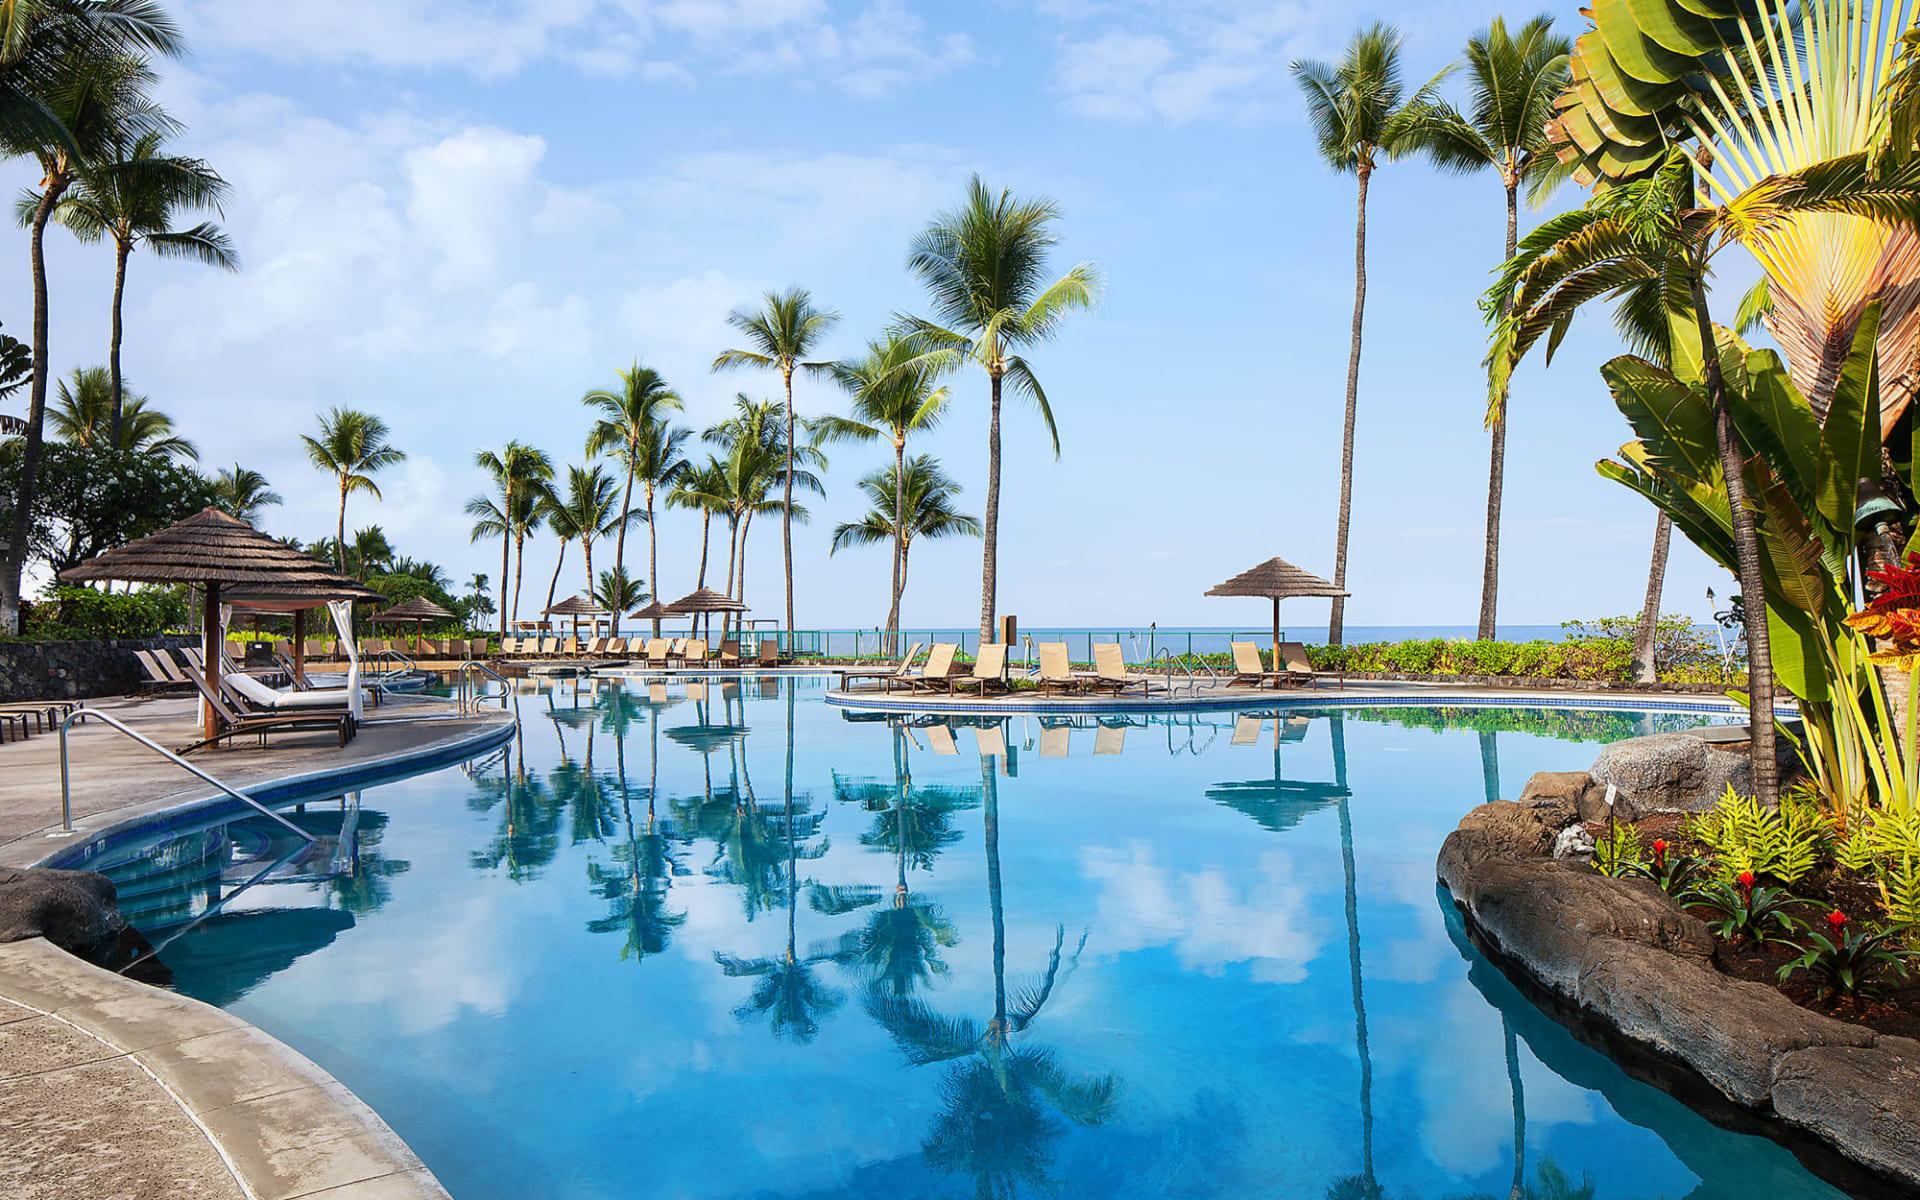 Sheraton Kona Resort & Spa at Keauhou Bay in Kailua-Kona: Facilities_Sheraton Kona Resort_Poollandschaft 2_Hotelchain